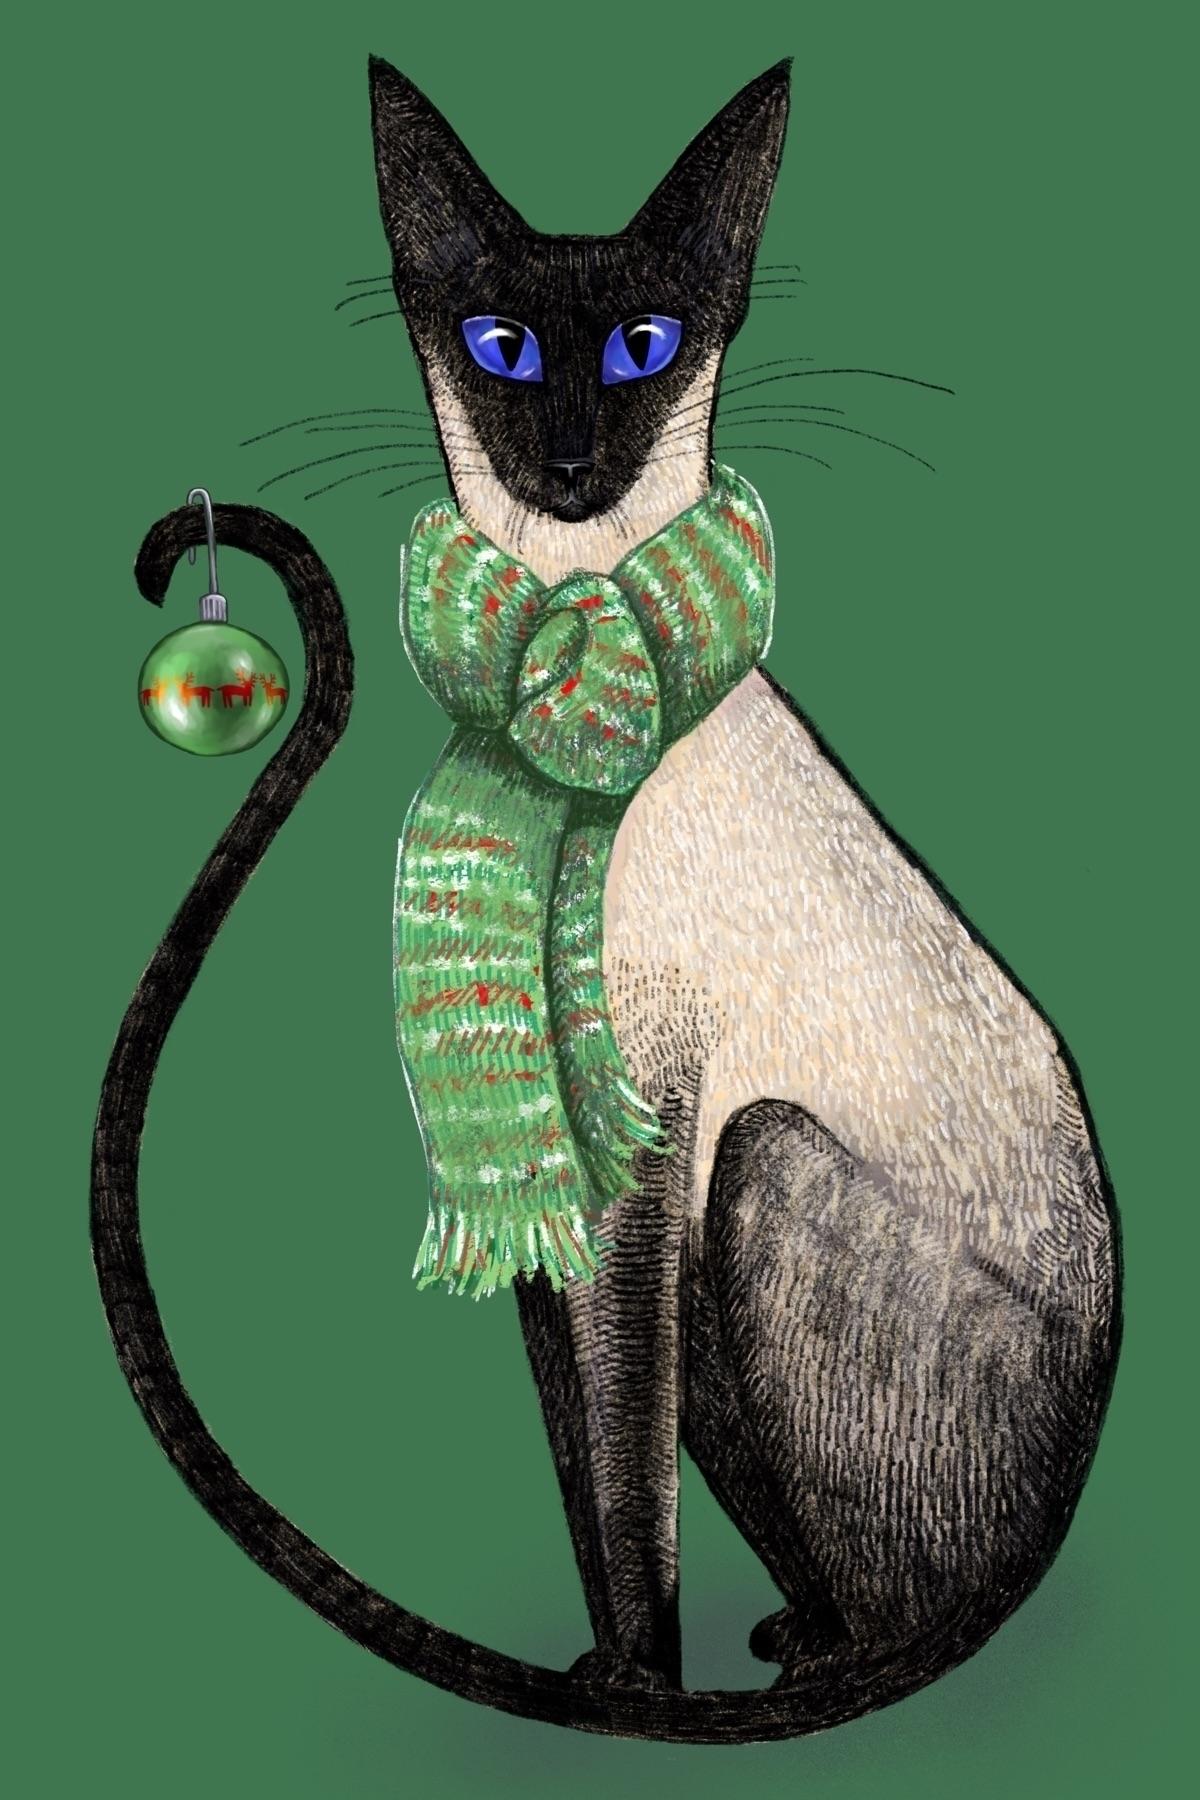 Christmas Siamese - cat, art, illustration - reneeleigh | ello